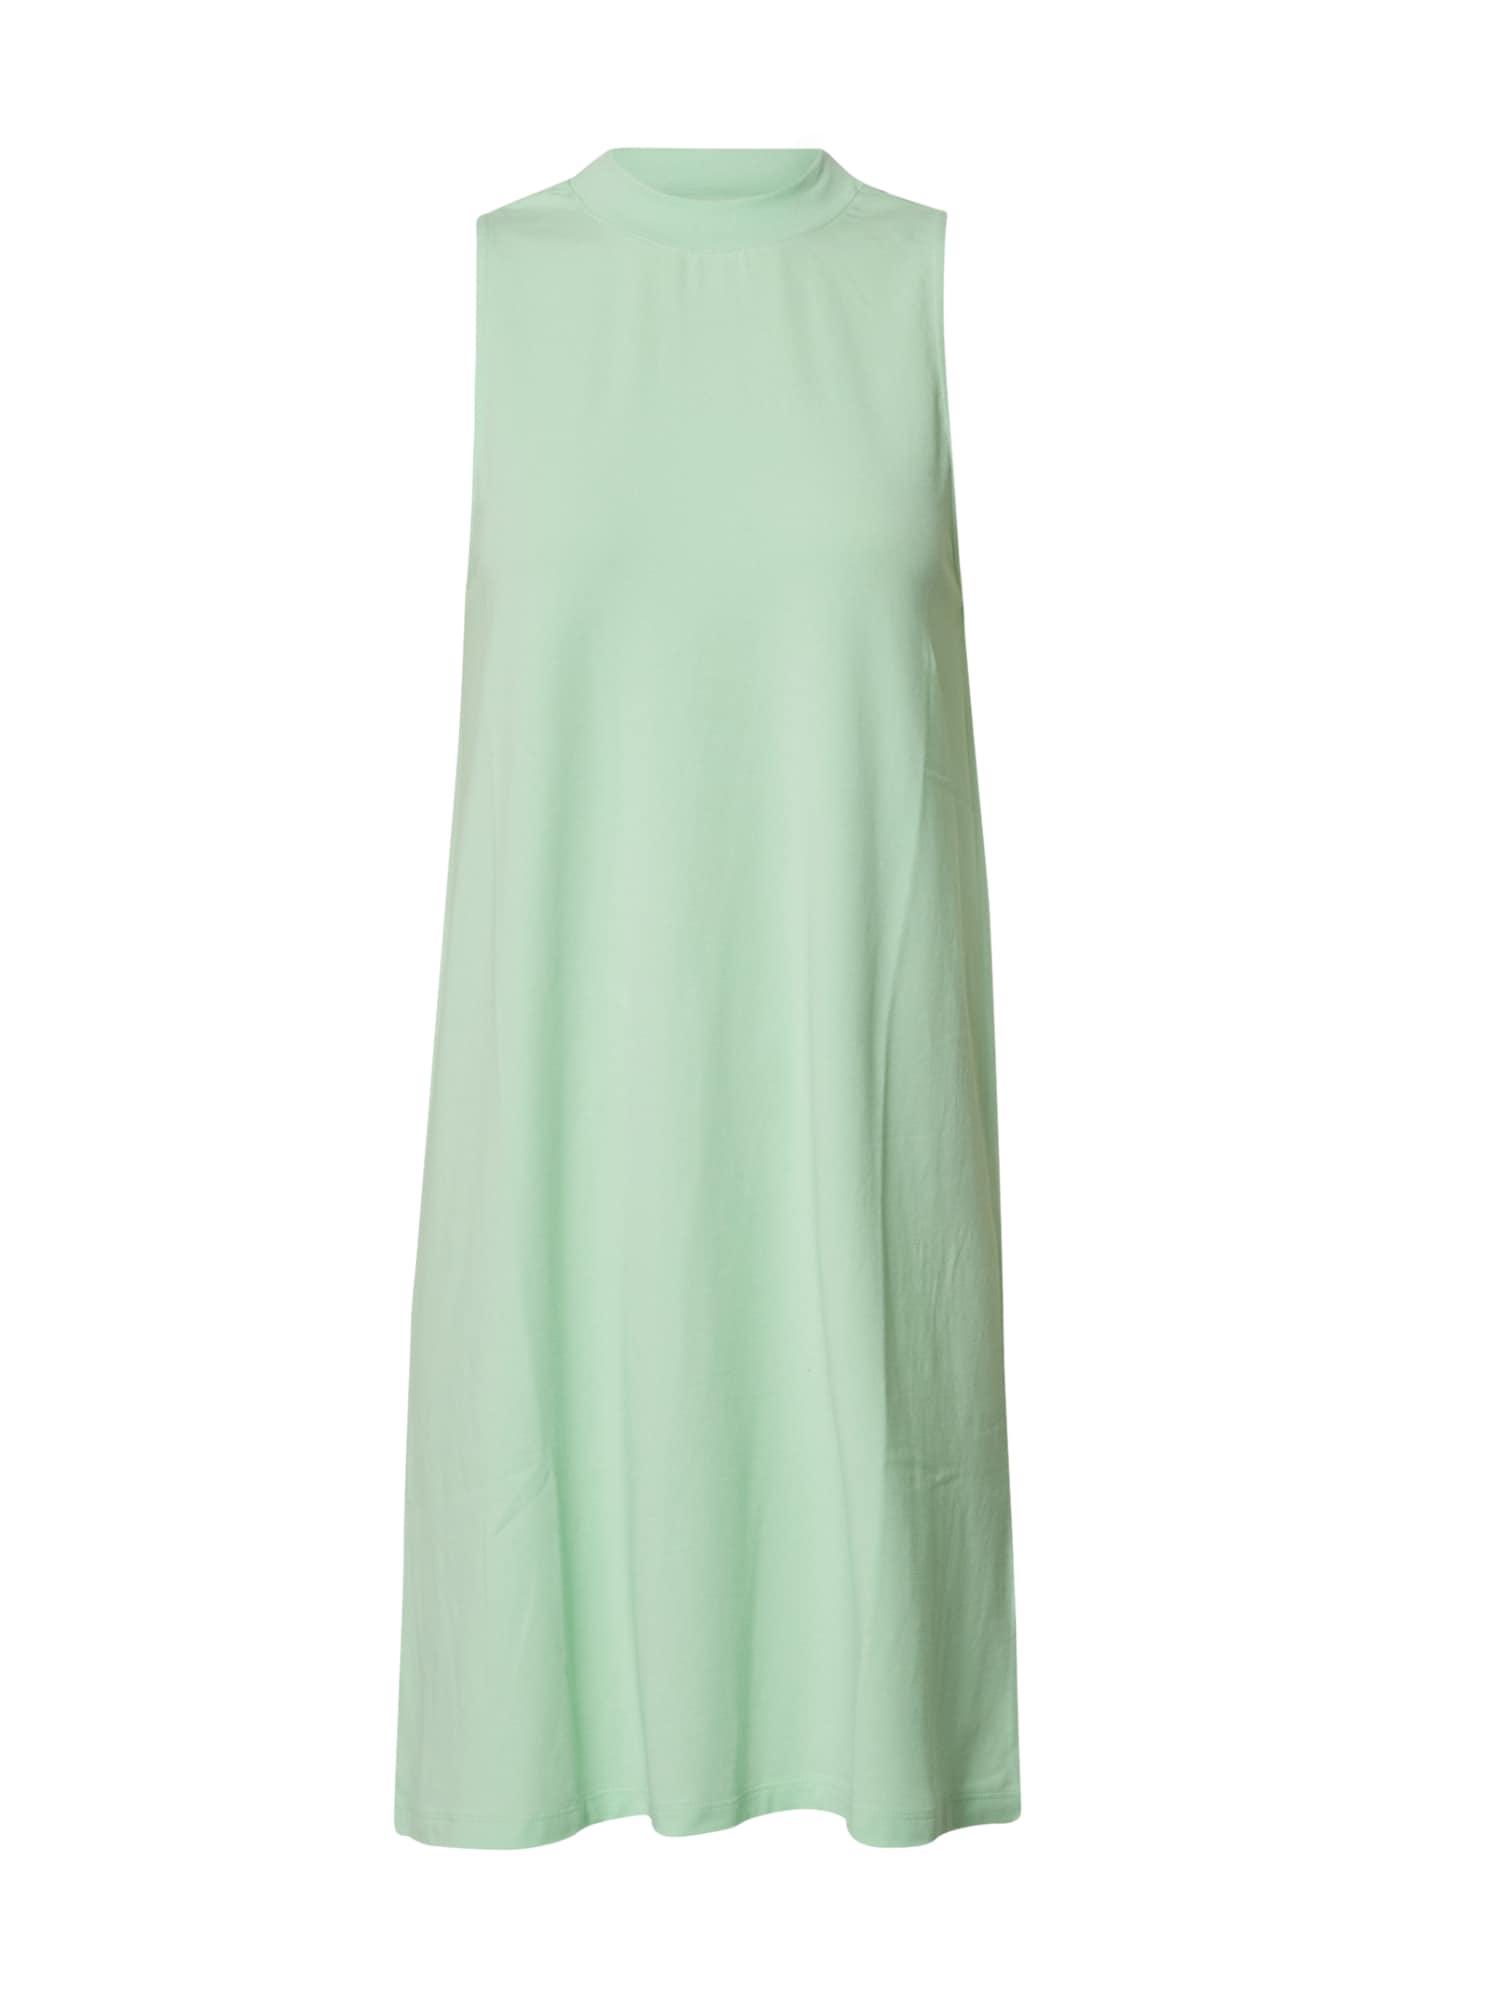 EDITED Suknelė 'Aleana' žalia